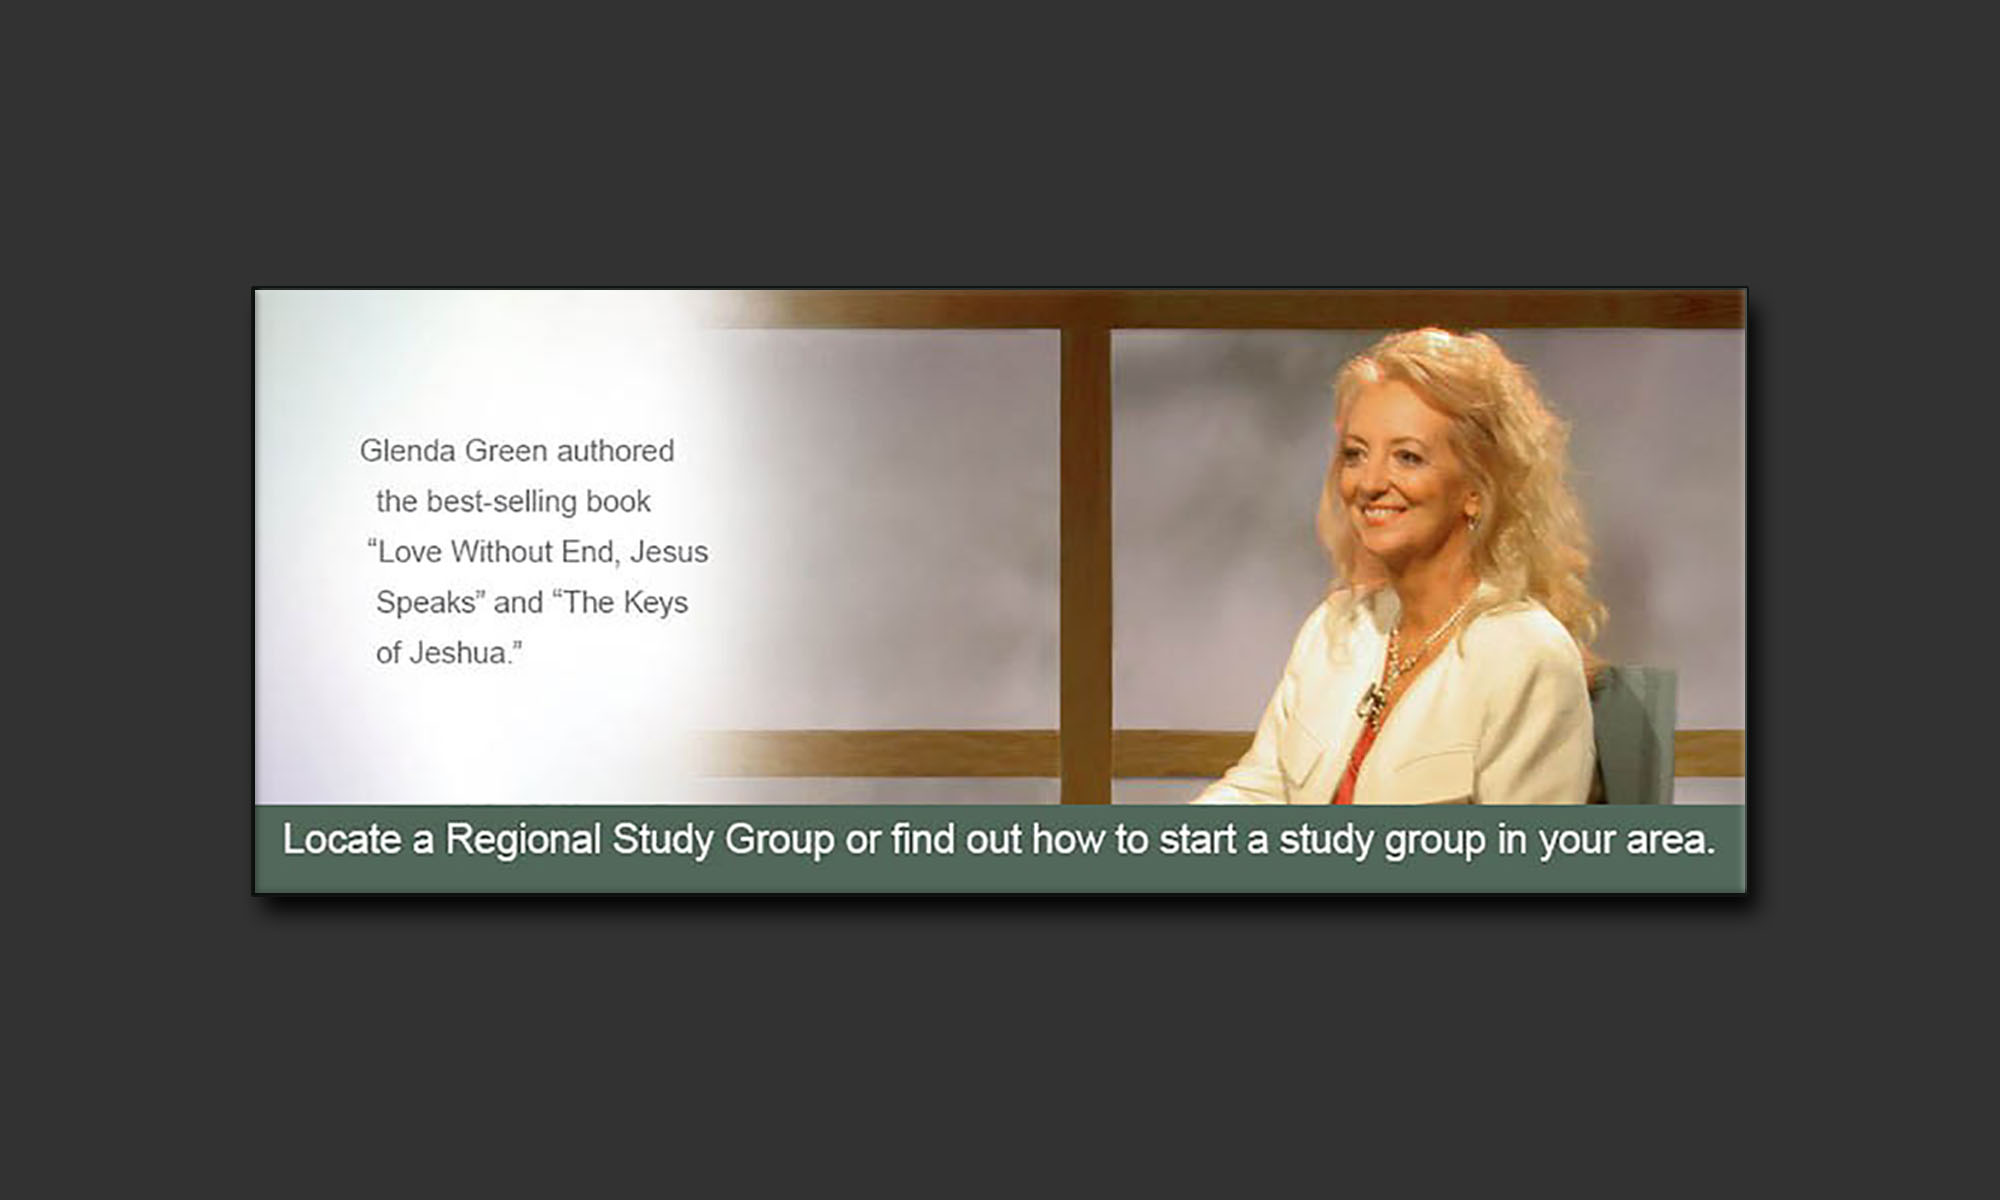 Glenda Green Portrait with message